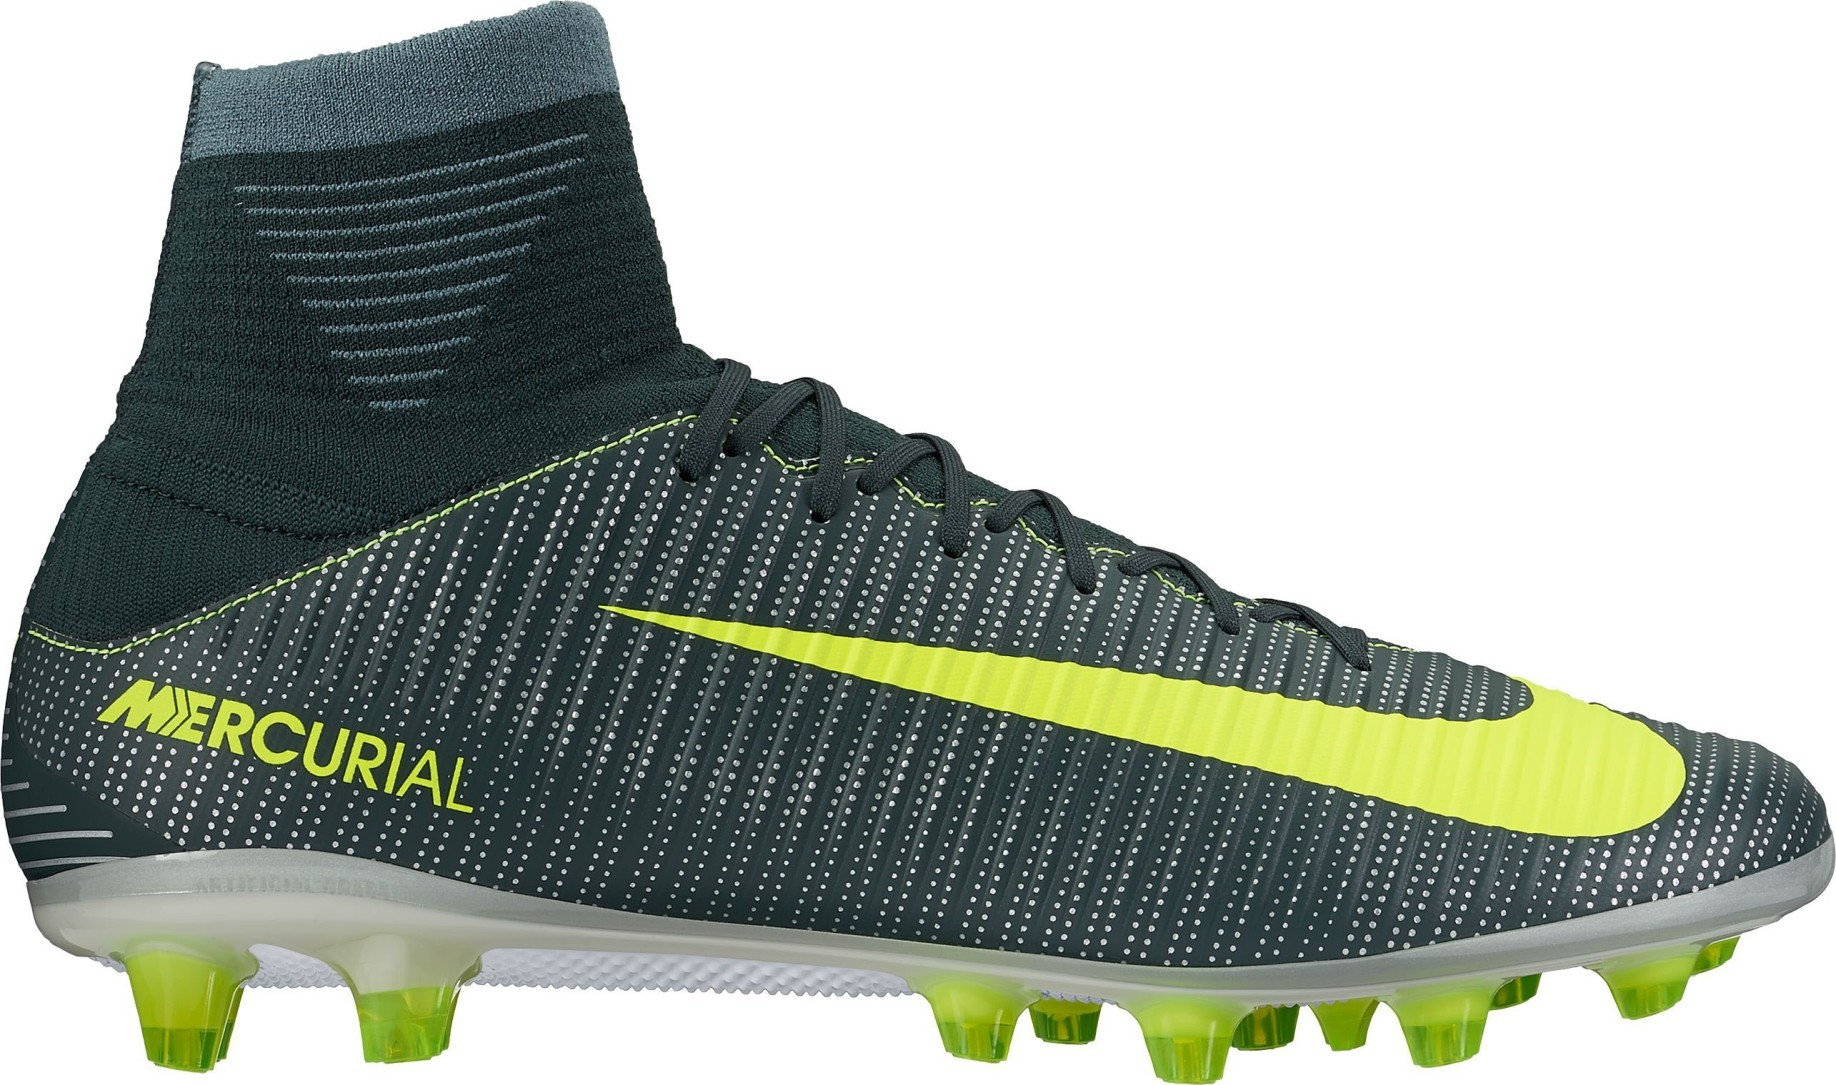 scarpe calcio nike mercurial cr7